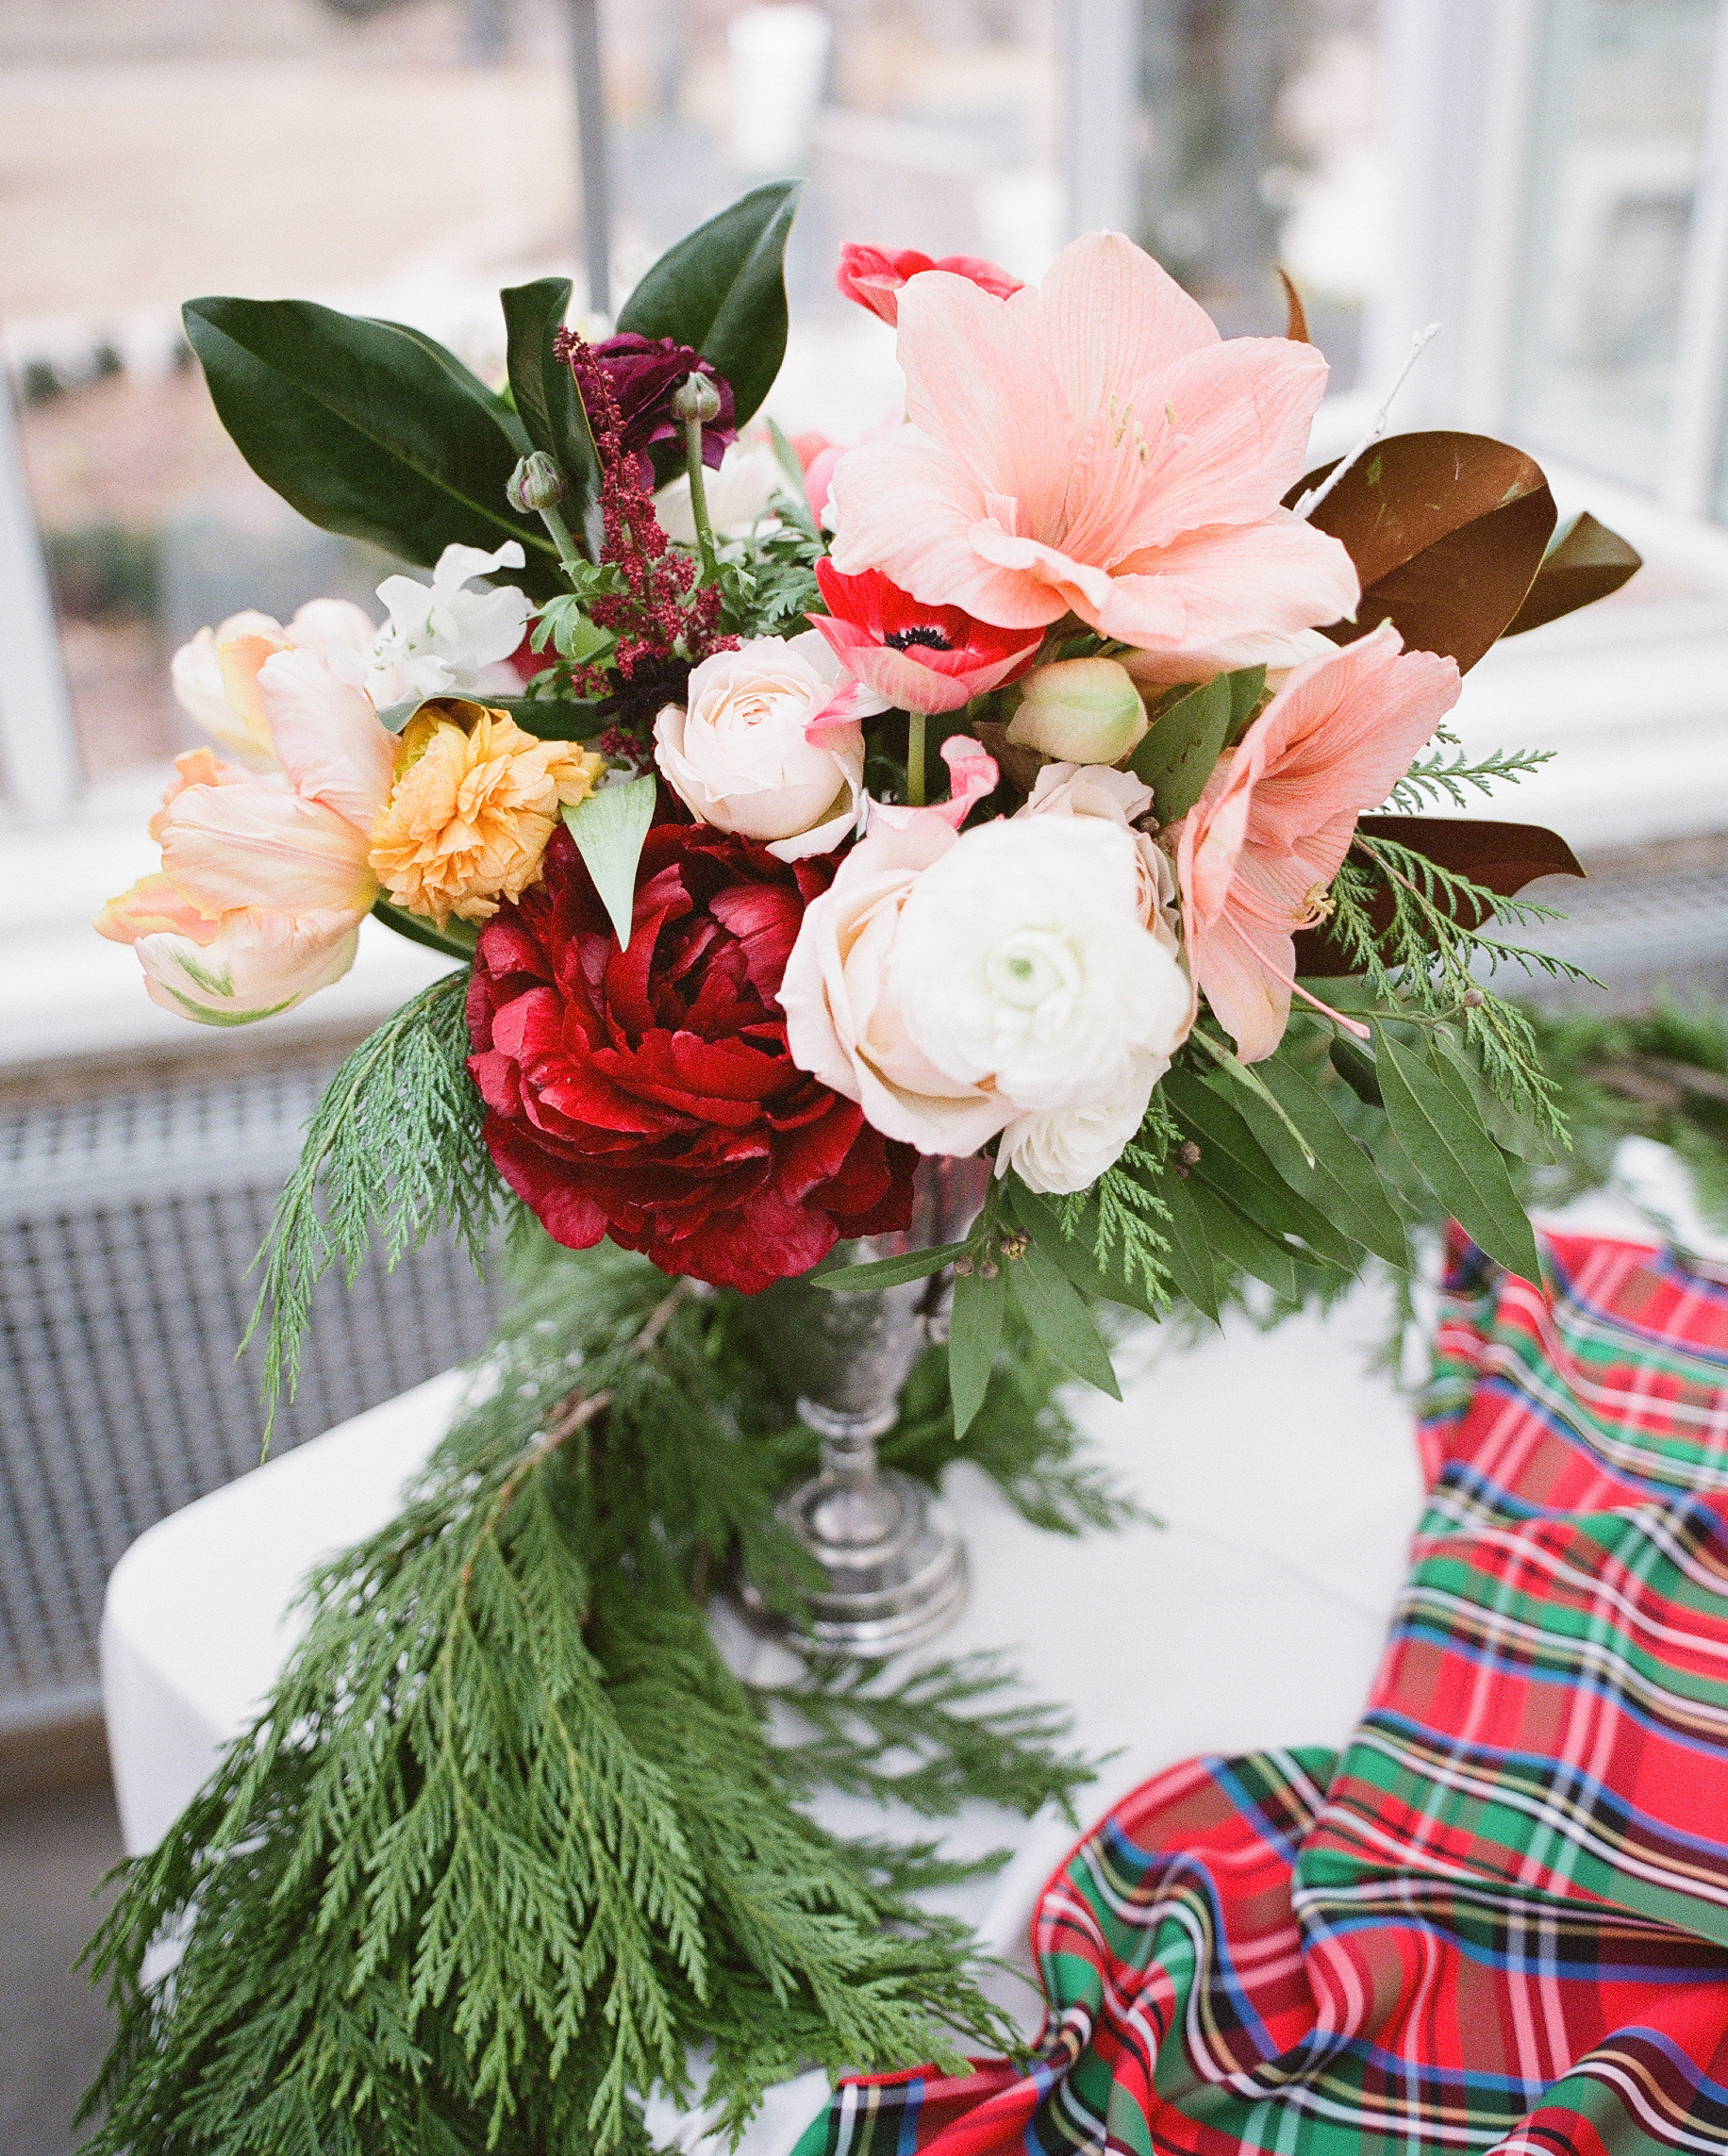 Vermont Wedding Flowers: 32 Unique Ideas For Winter Wedding Favors